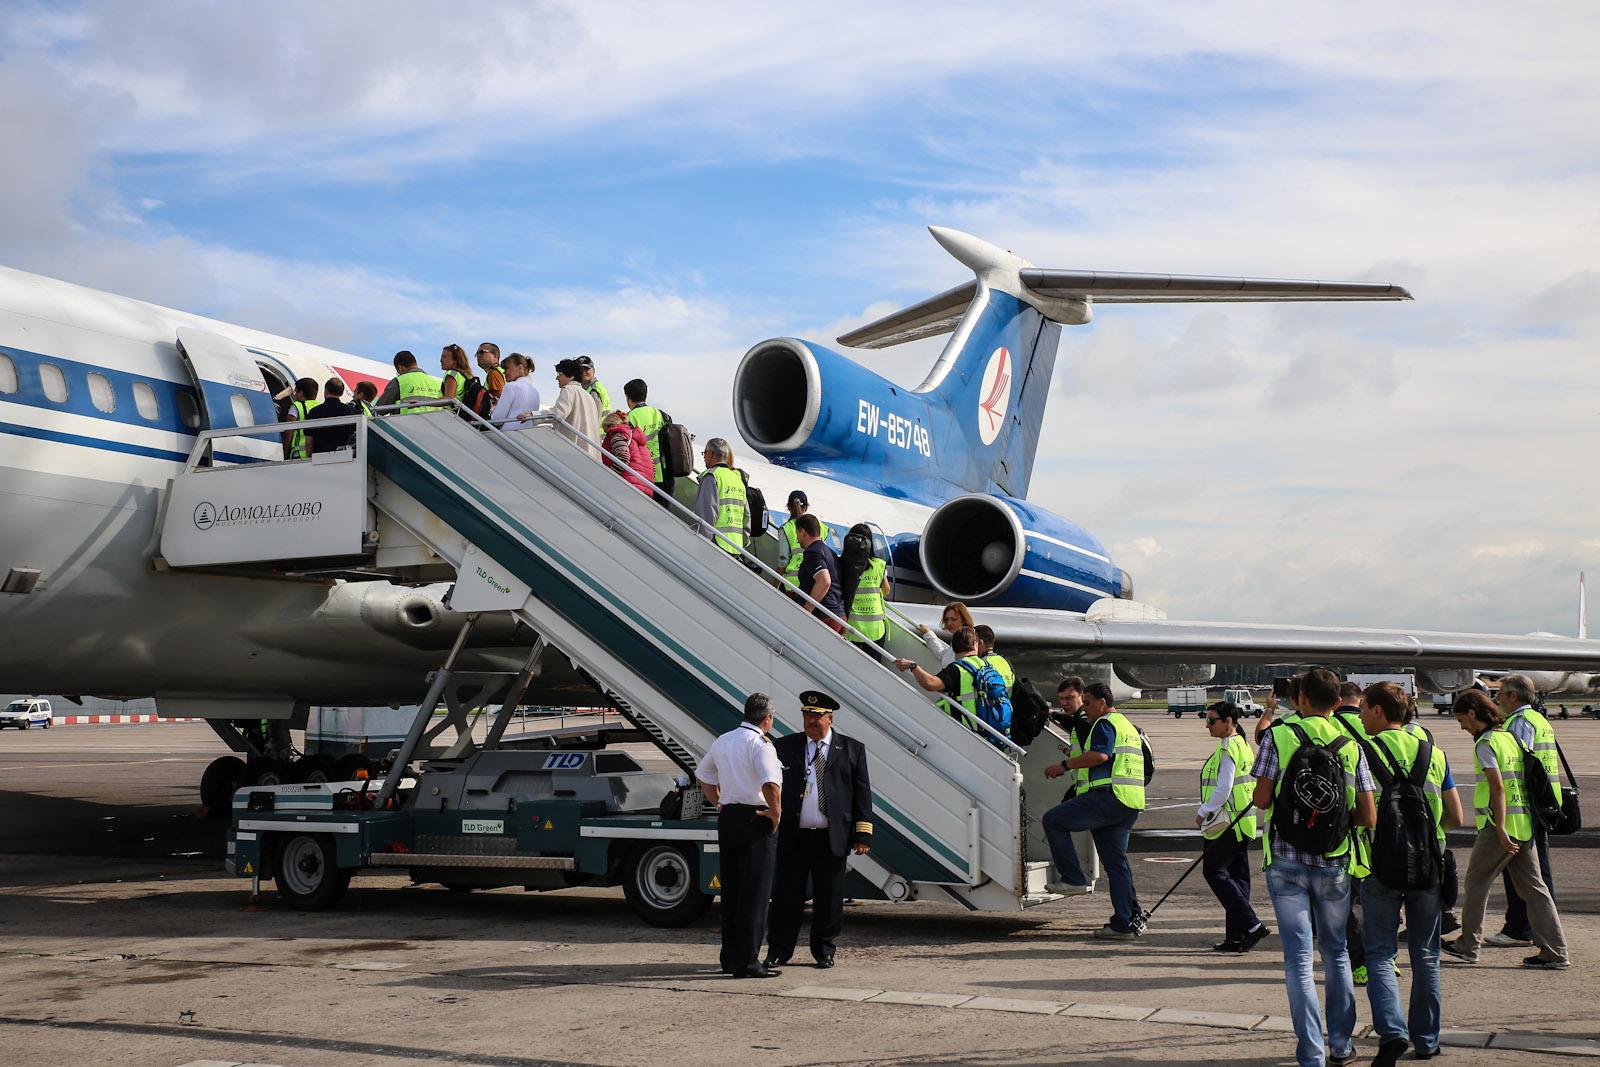 Посадка на рейс Ту-154